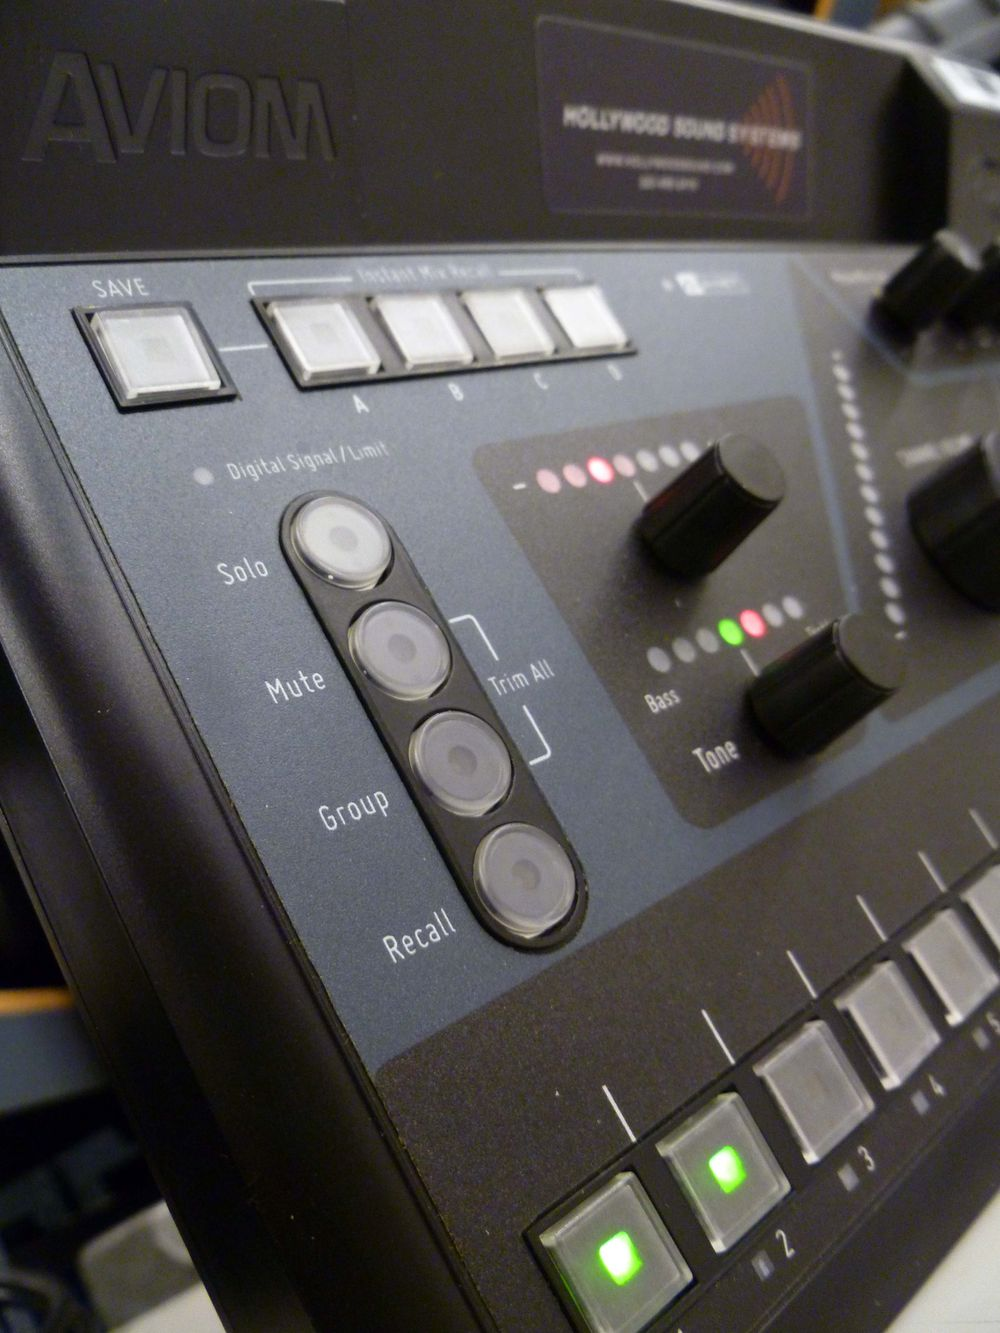 Aviom A360 provides a variety of controls.